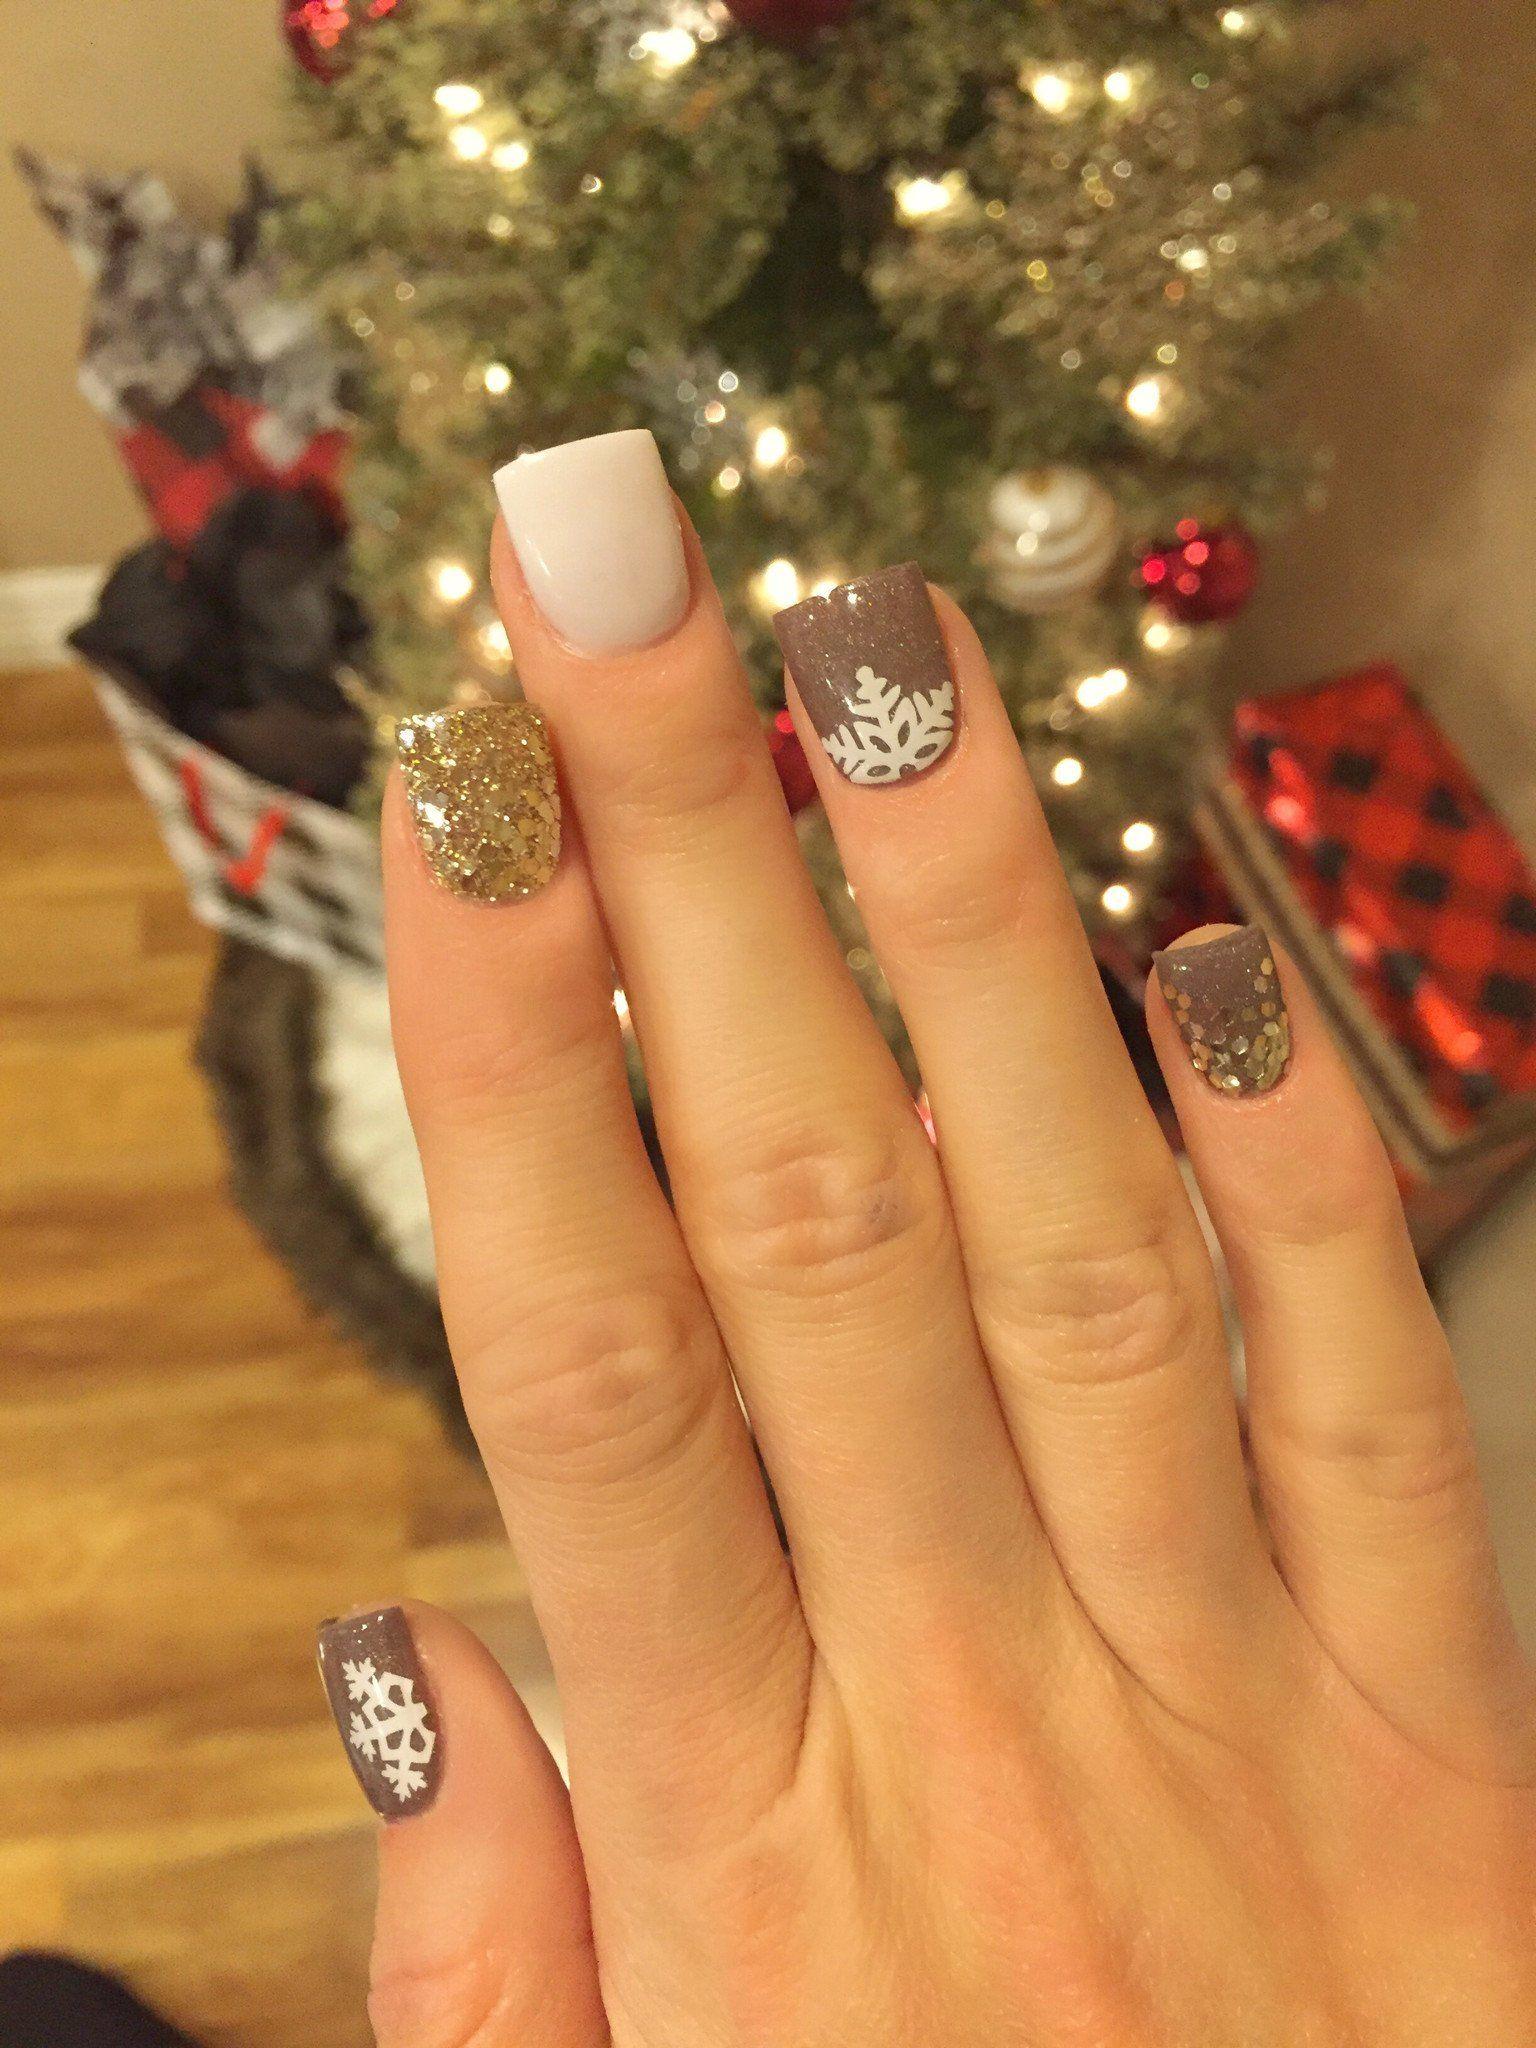 45 simple festive christmas acrylic nail designs for winter 45 simple festive christmas acrylic nail designs for winter prinsesfo Choice Image